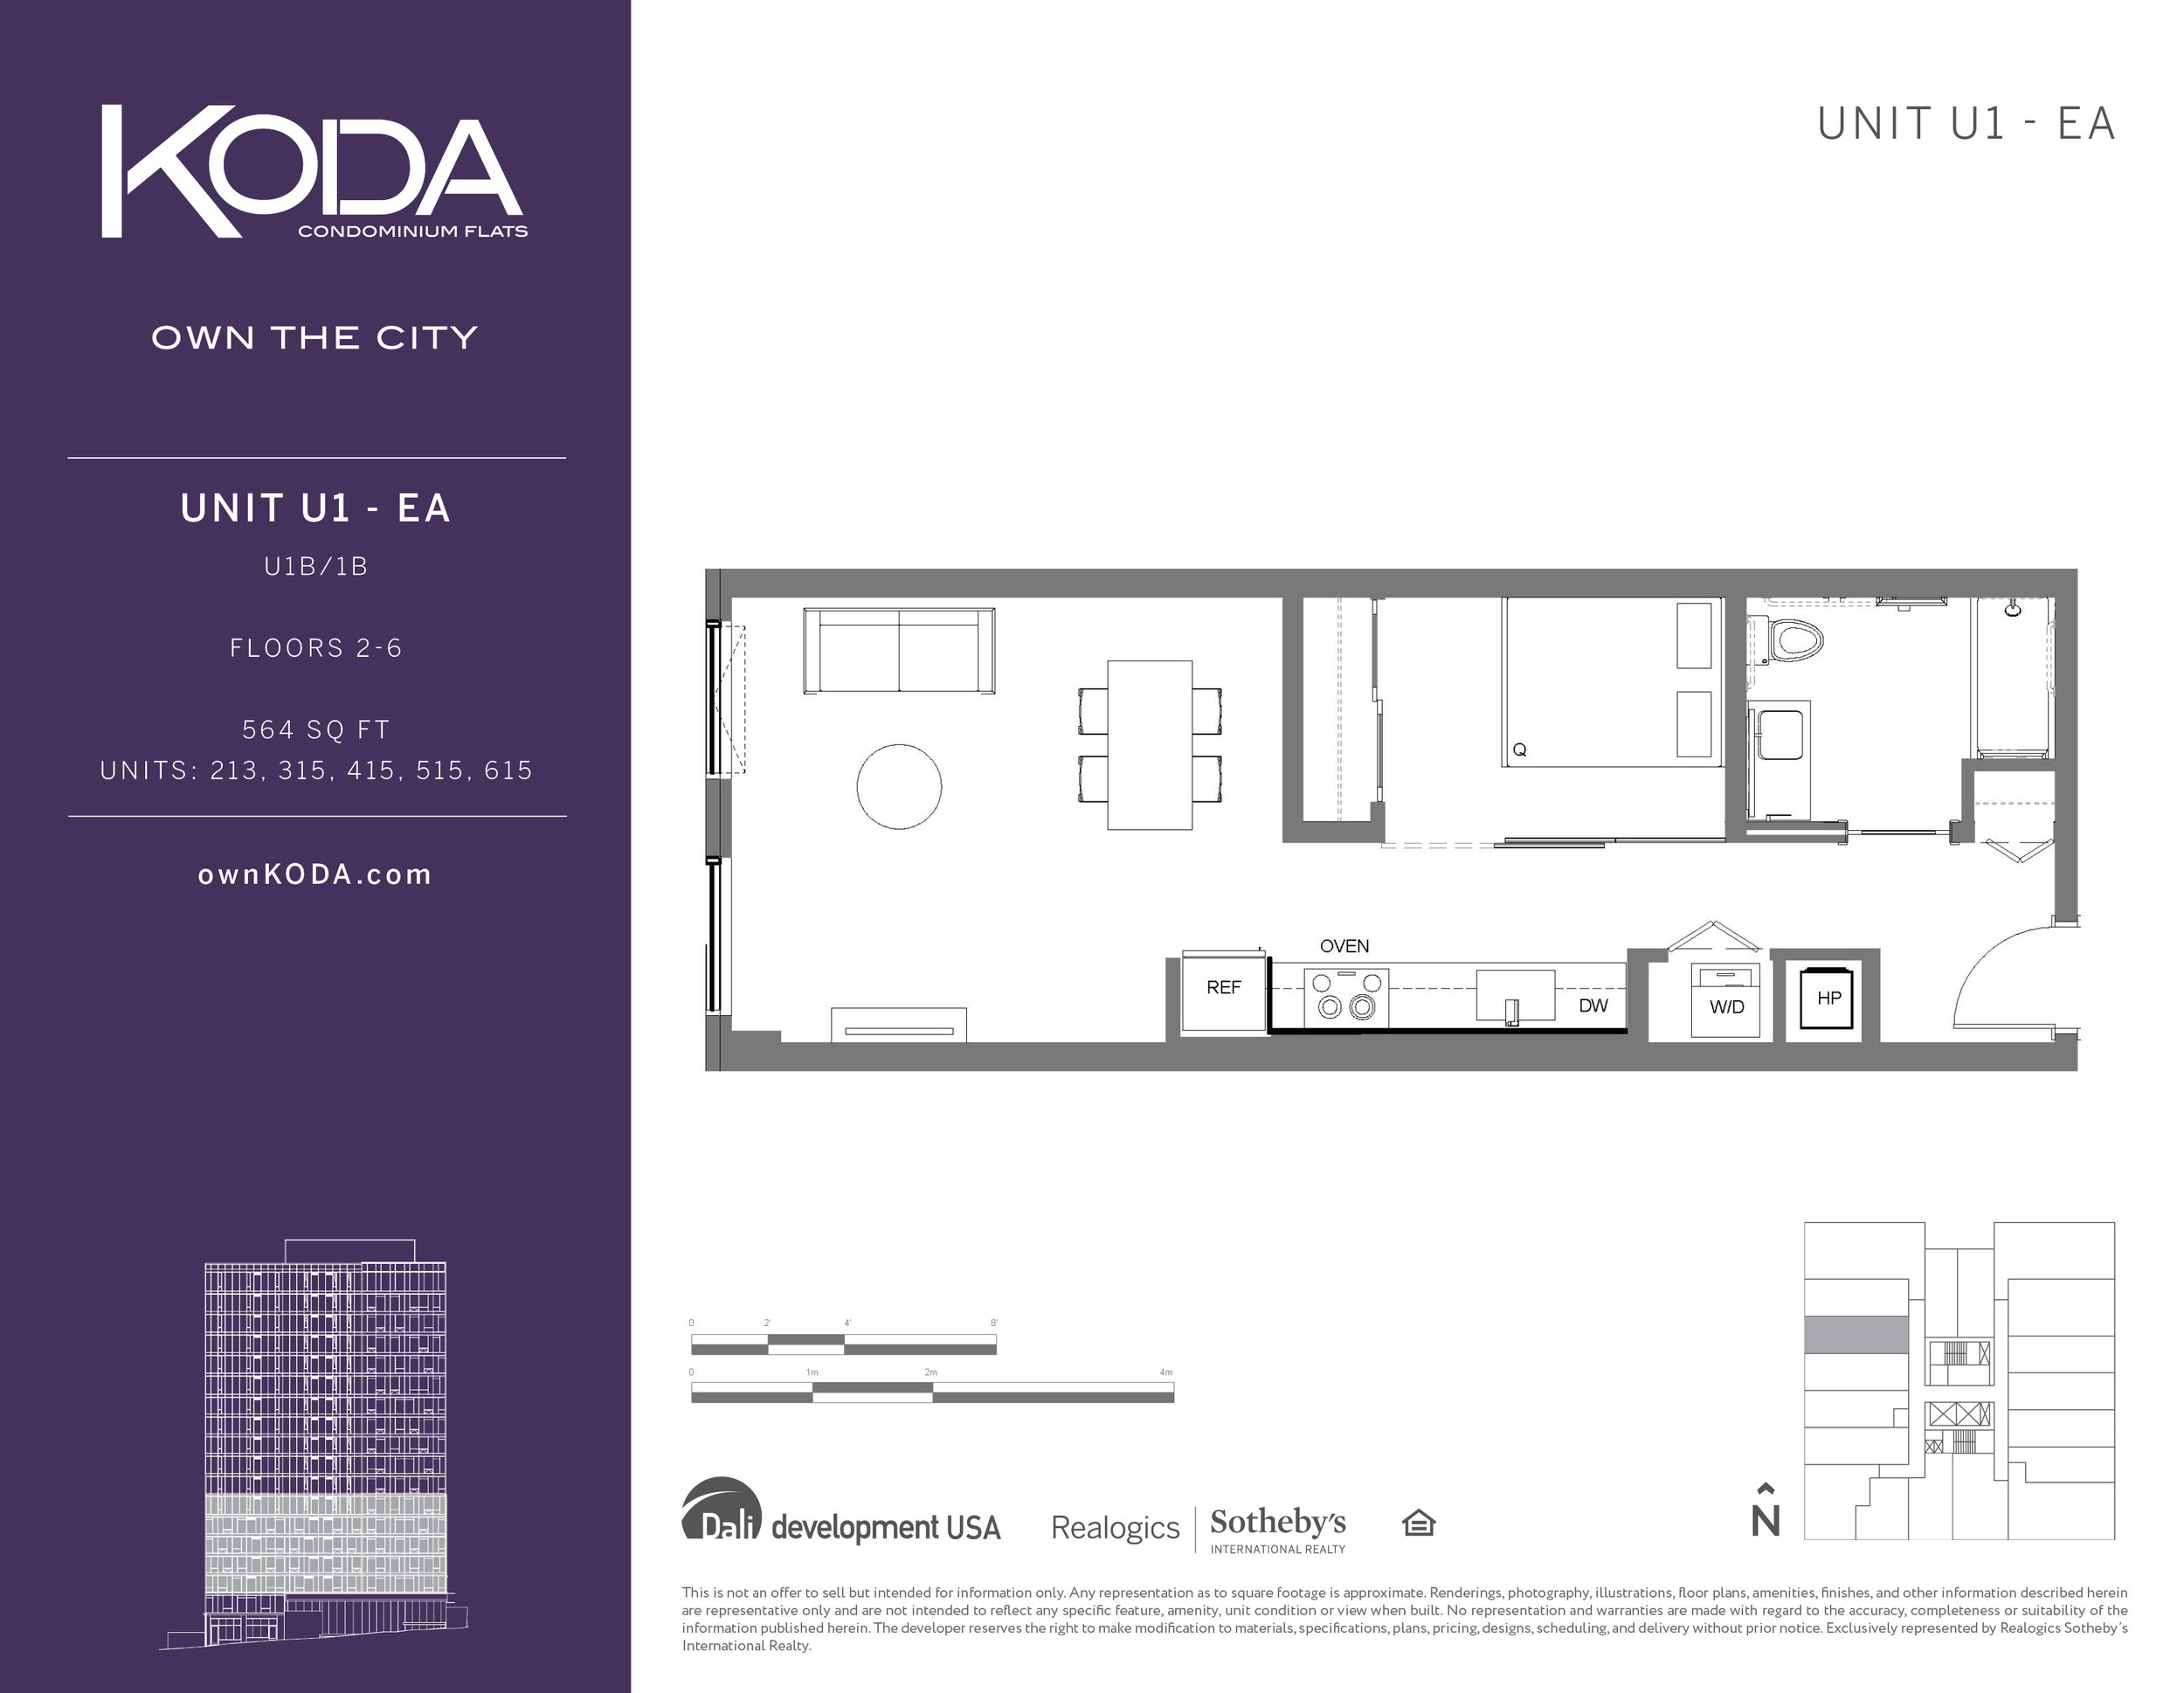 KODA_FloorPlanFlyer_Update_Approved_04.04.19_Release7.jpg